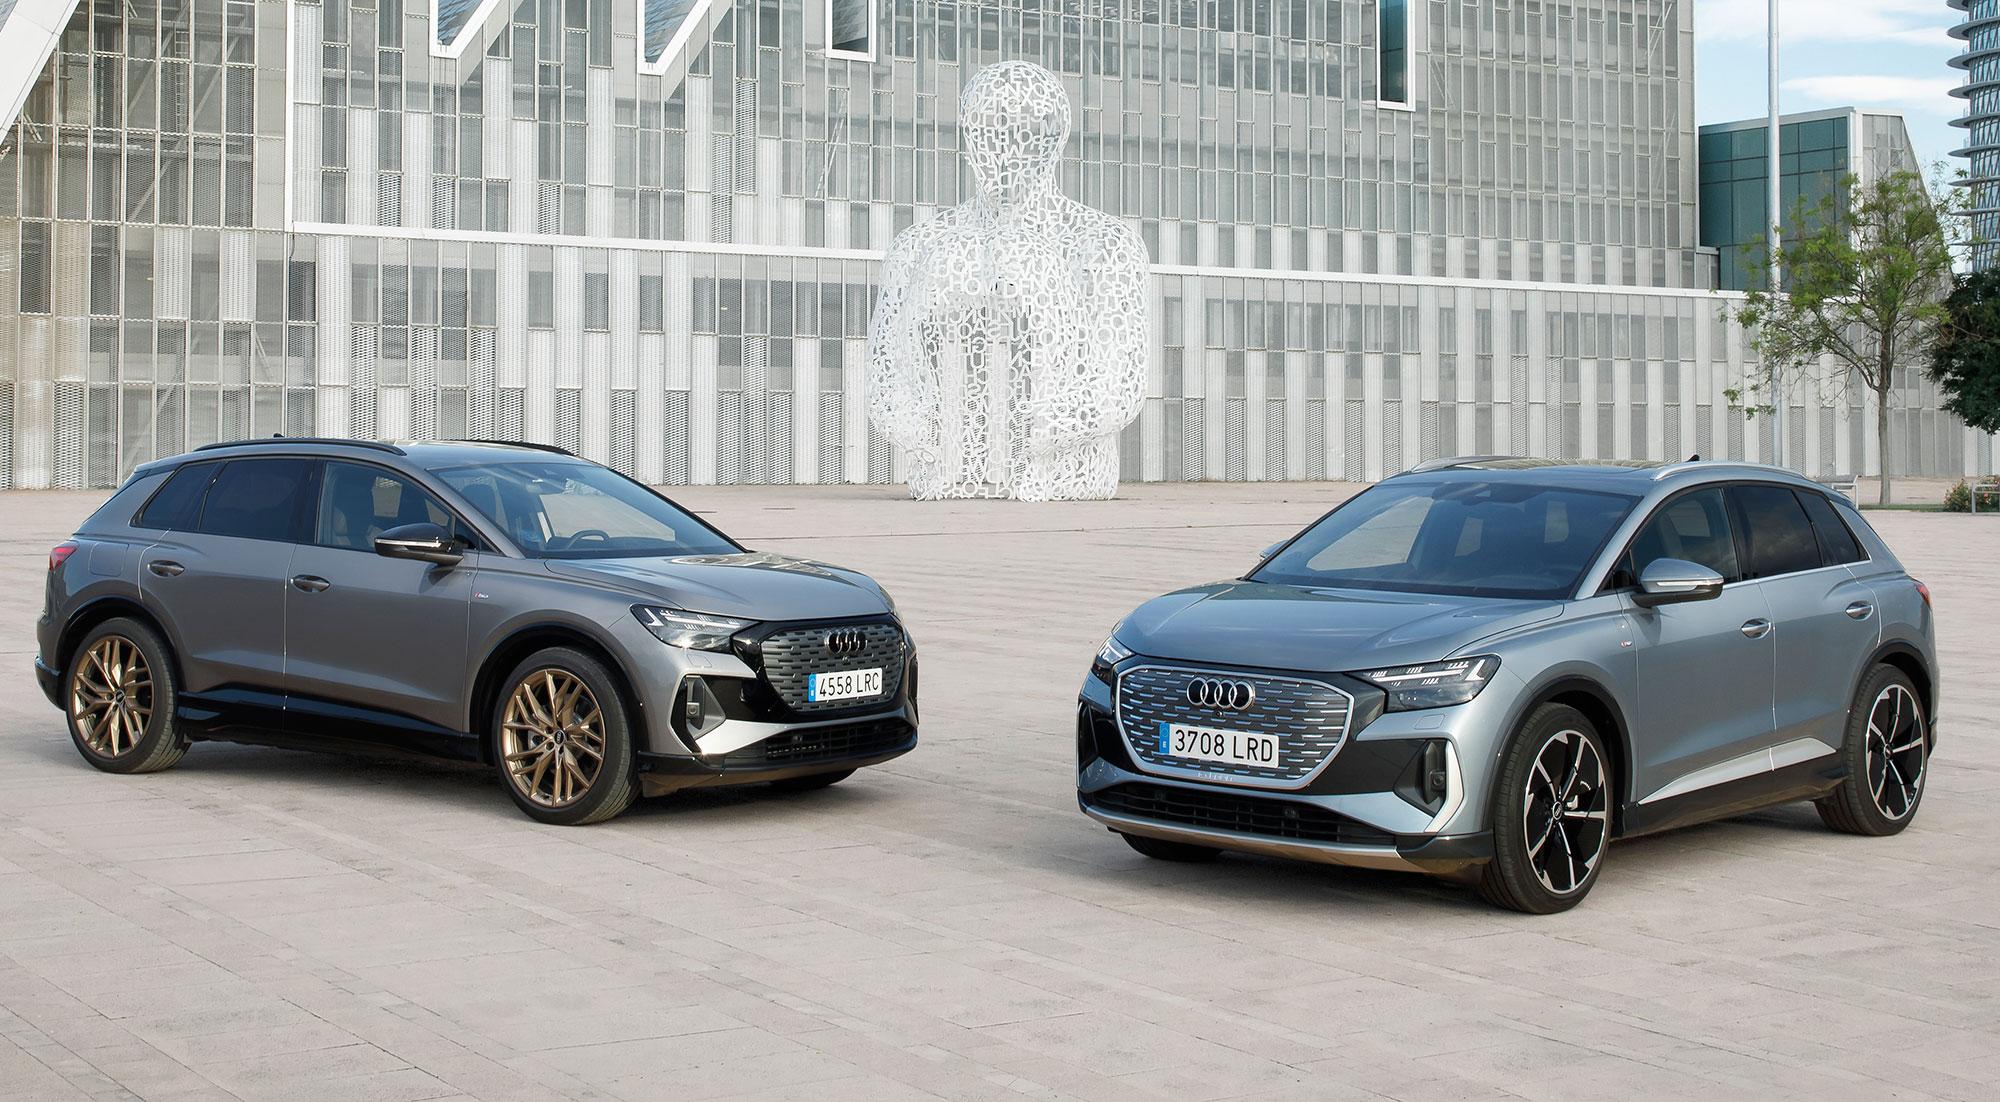 Las mejores imágenes del Audi Q4 e-tron